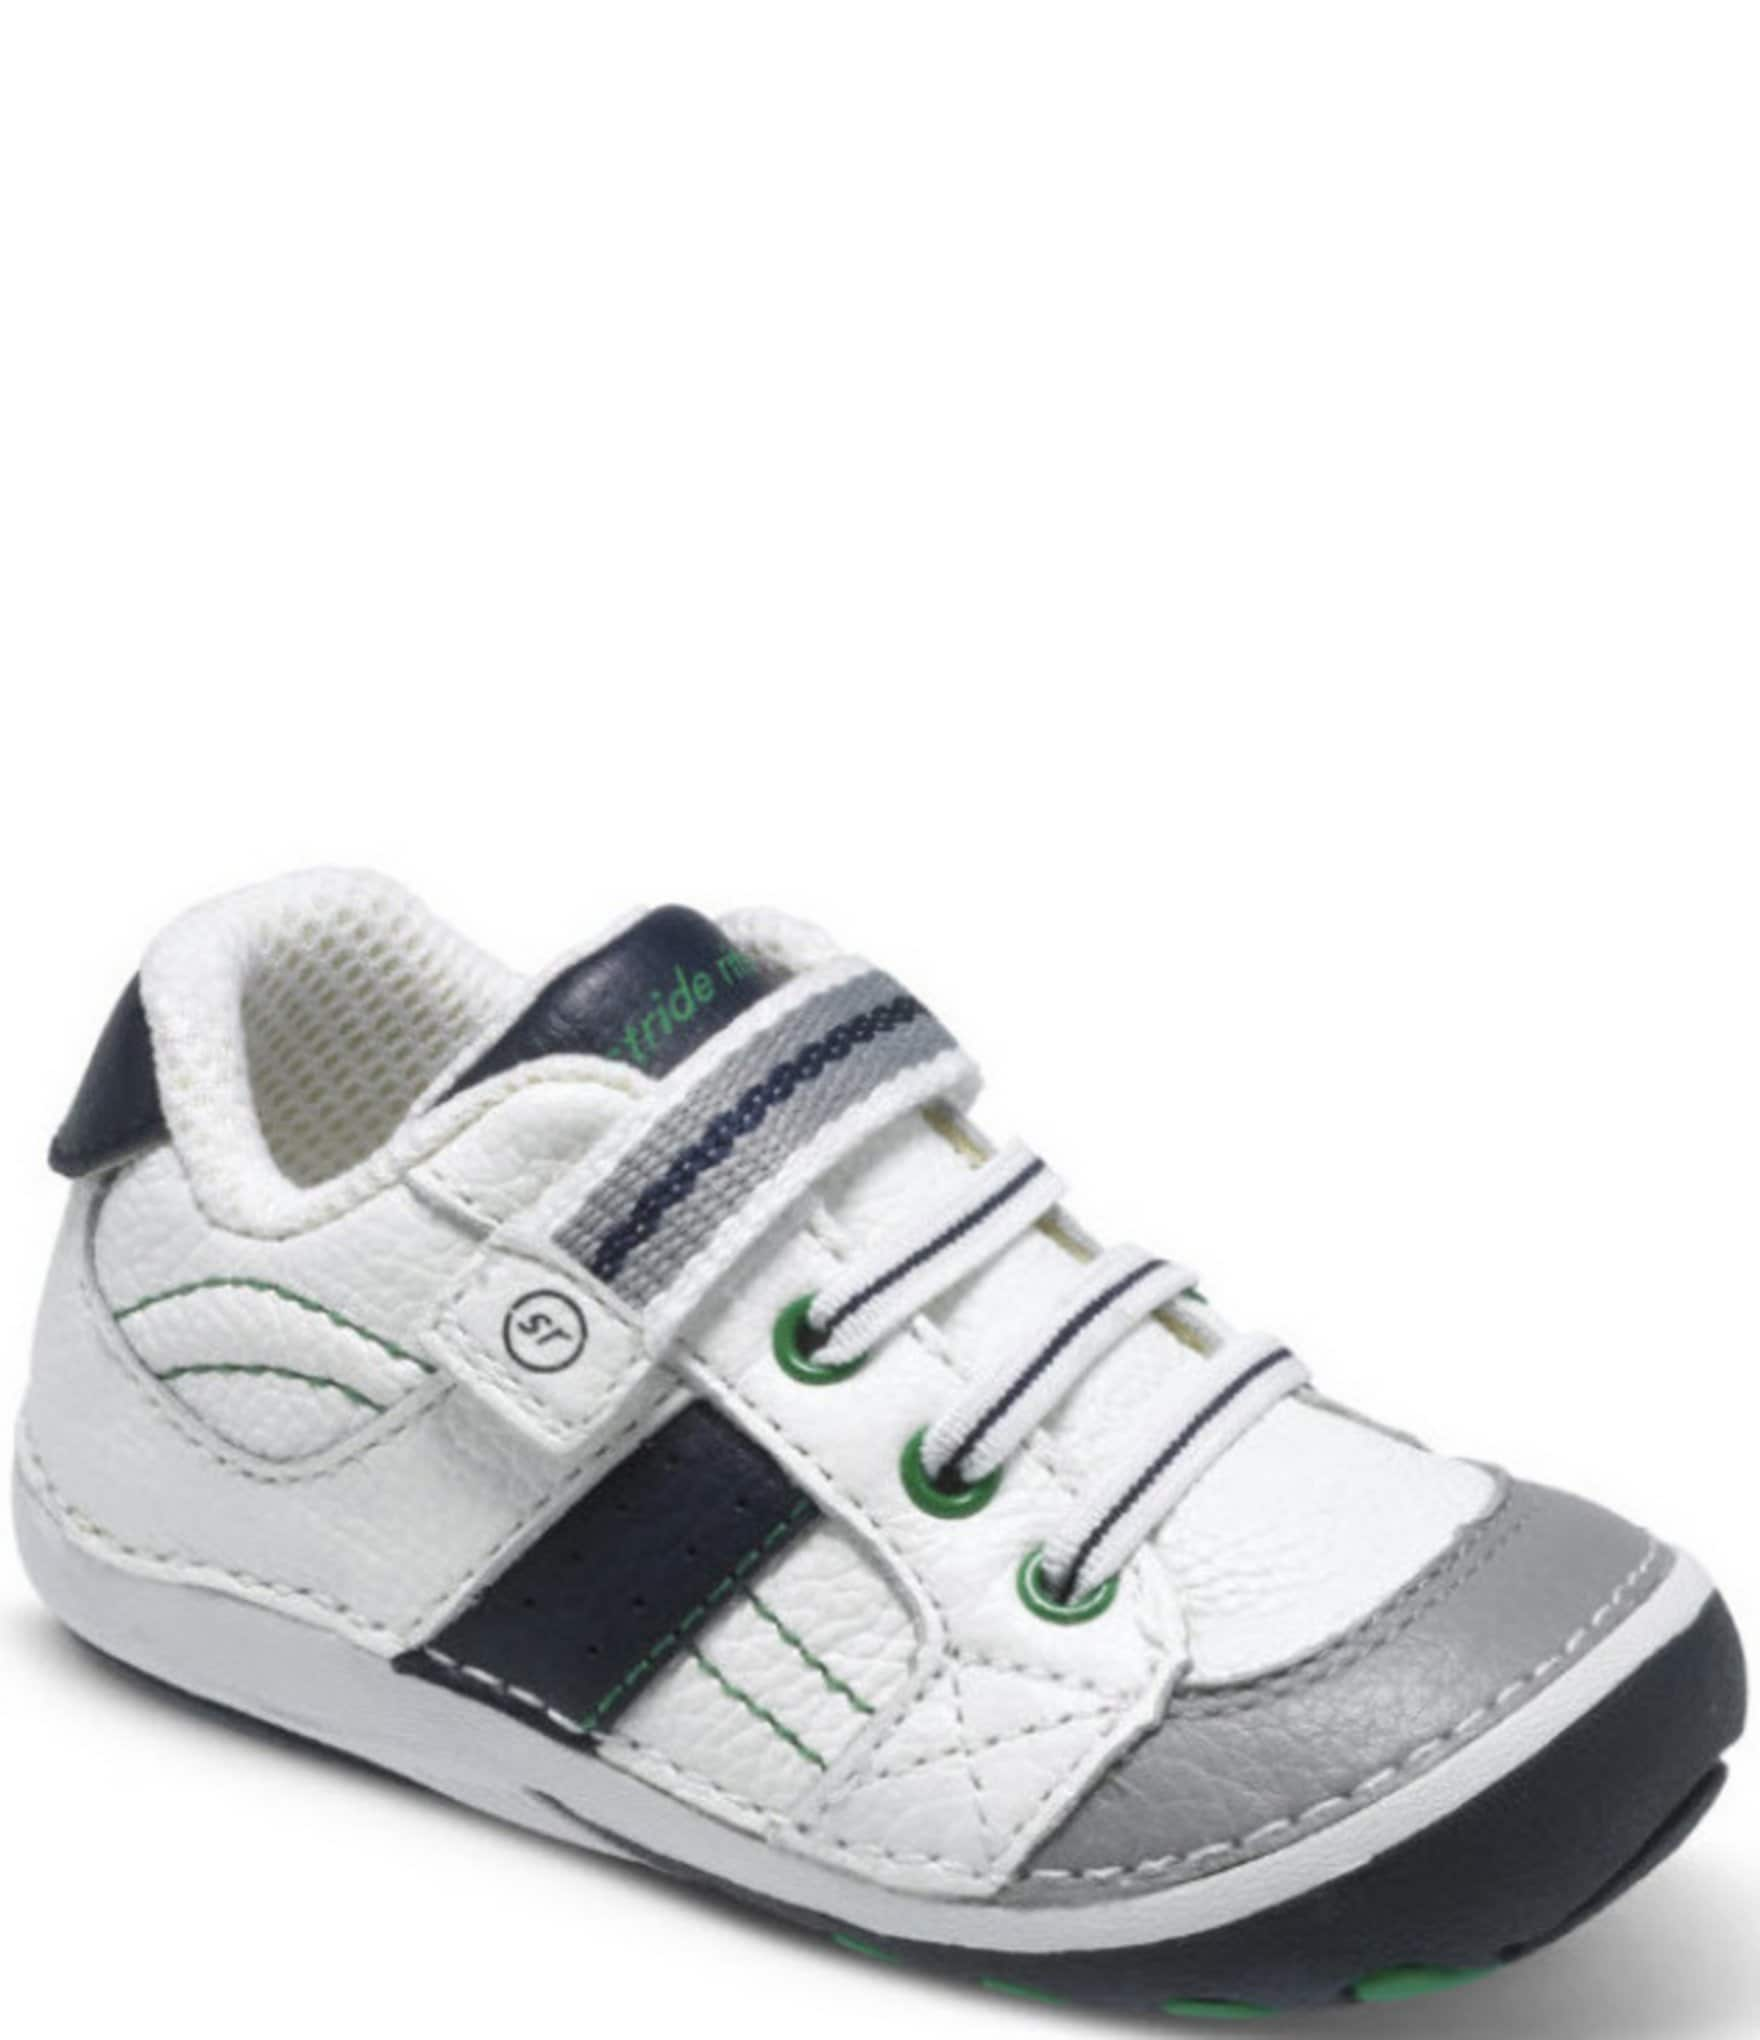 Stride Rite Baby Boys' Shoes   Dillard's